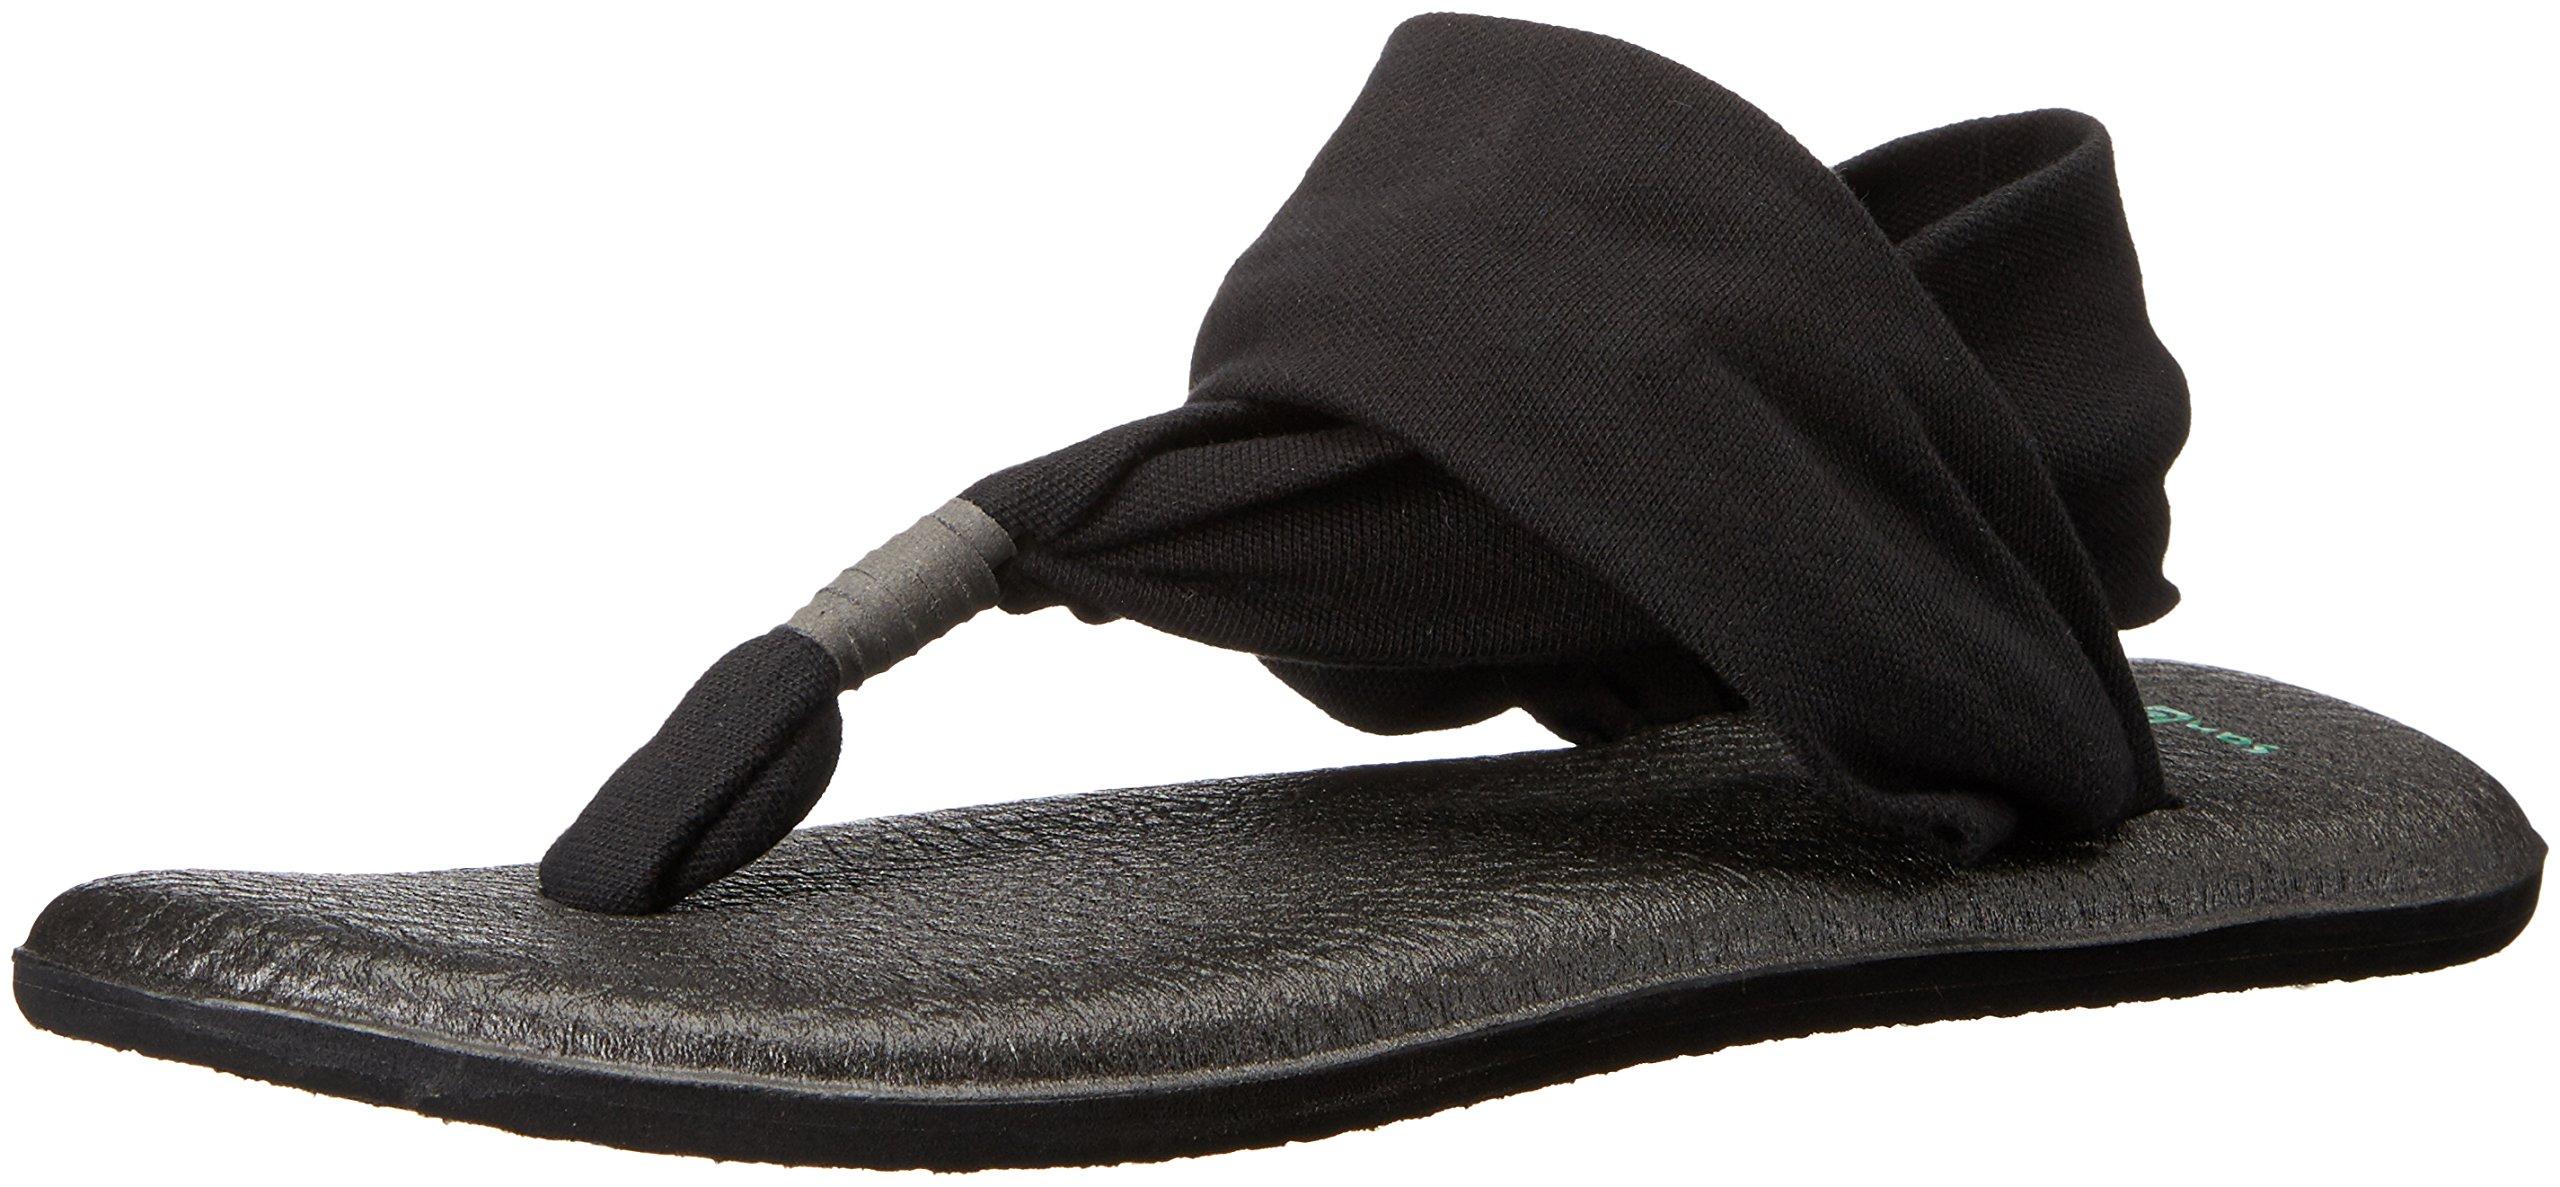 Sanuk Women's Yoga Sling 2 Flip Flop,Black,10 M US